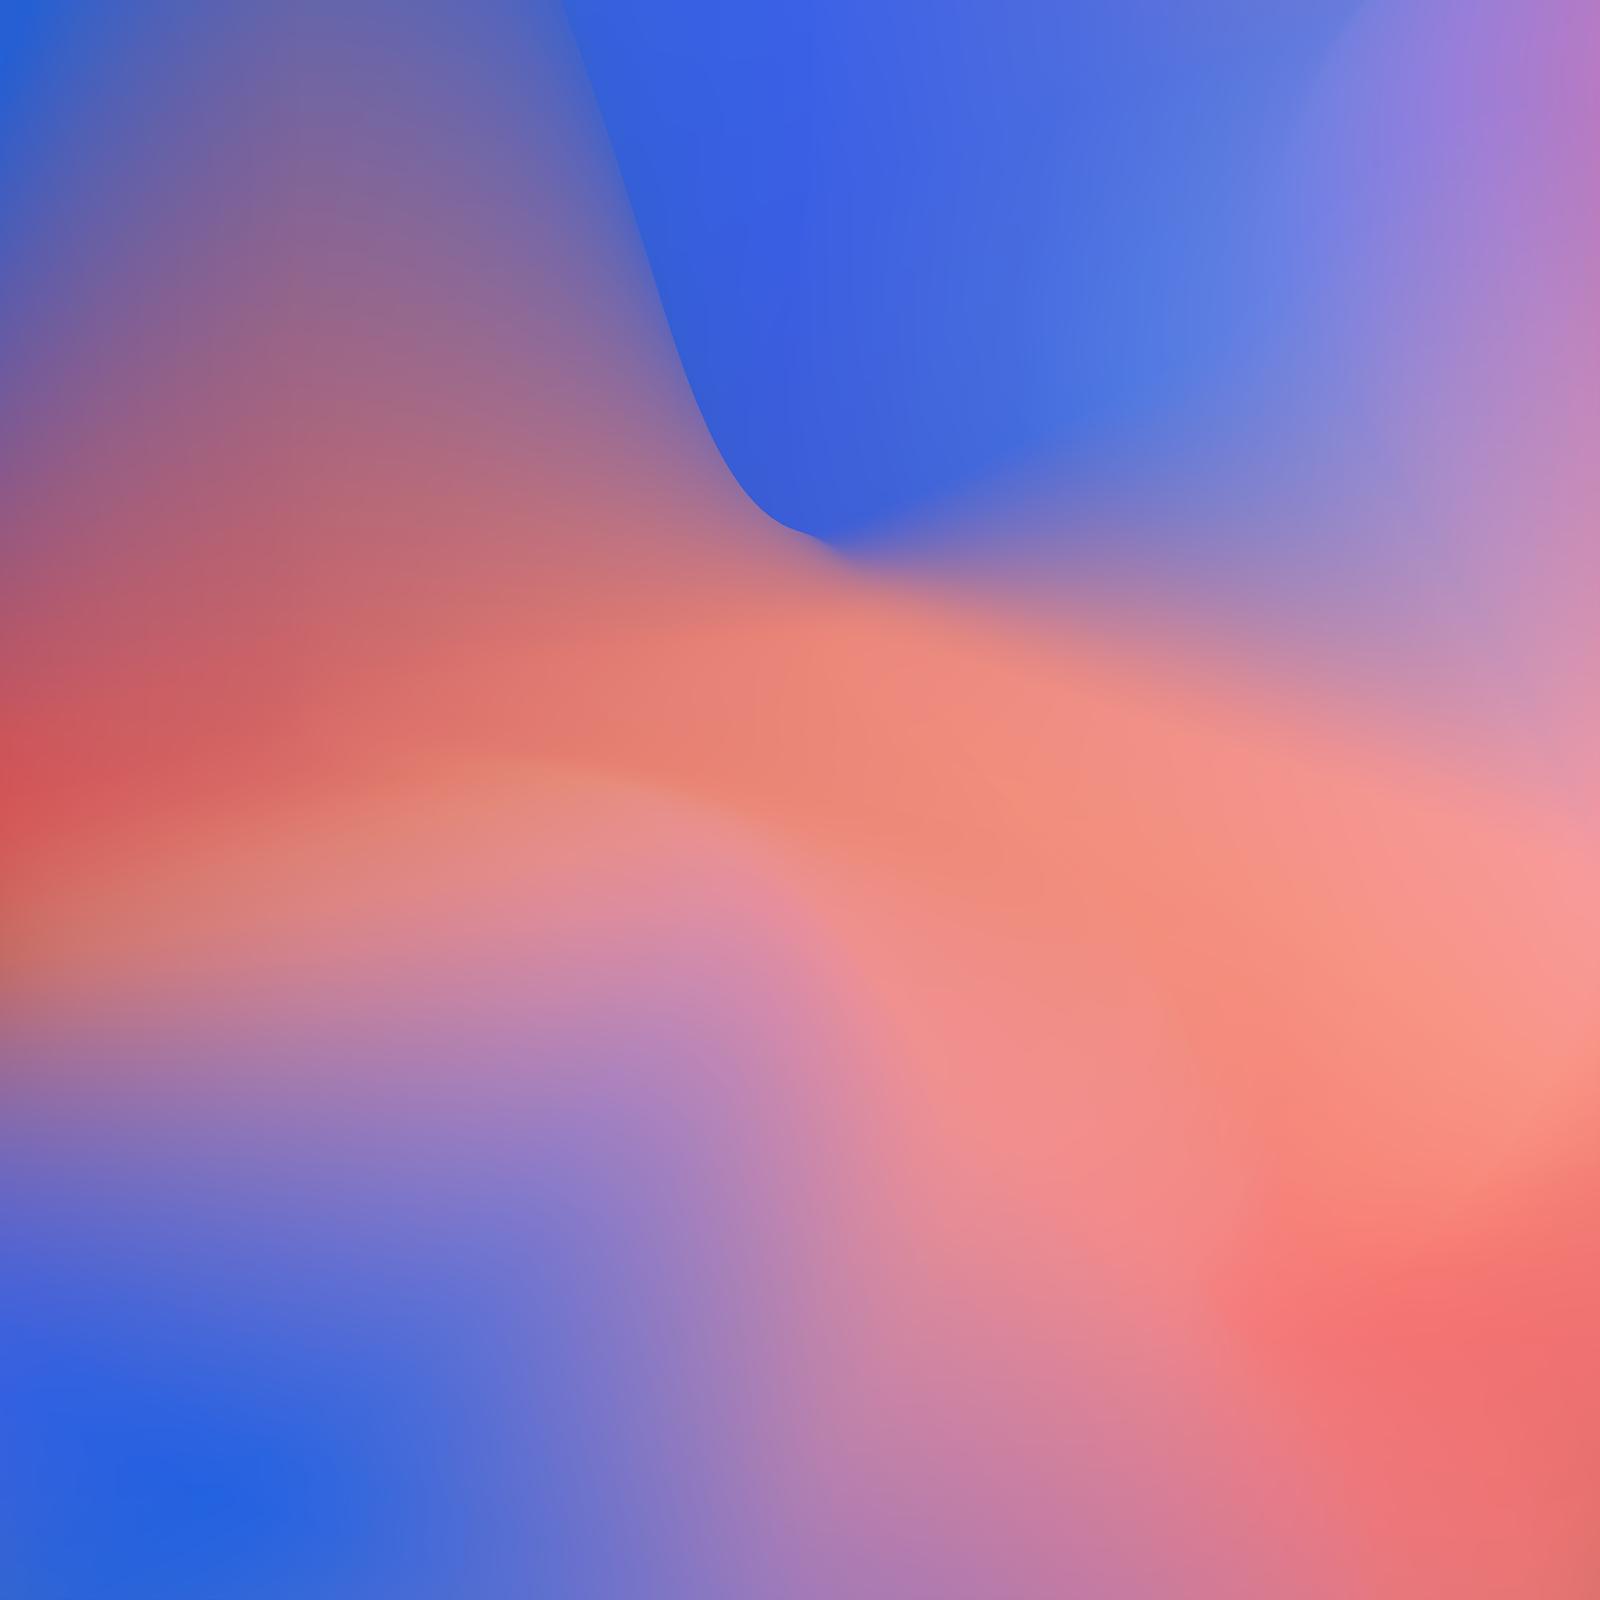 HD Google Pixel 3 XL Wallpapers - Kak Theo